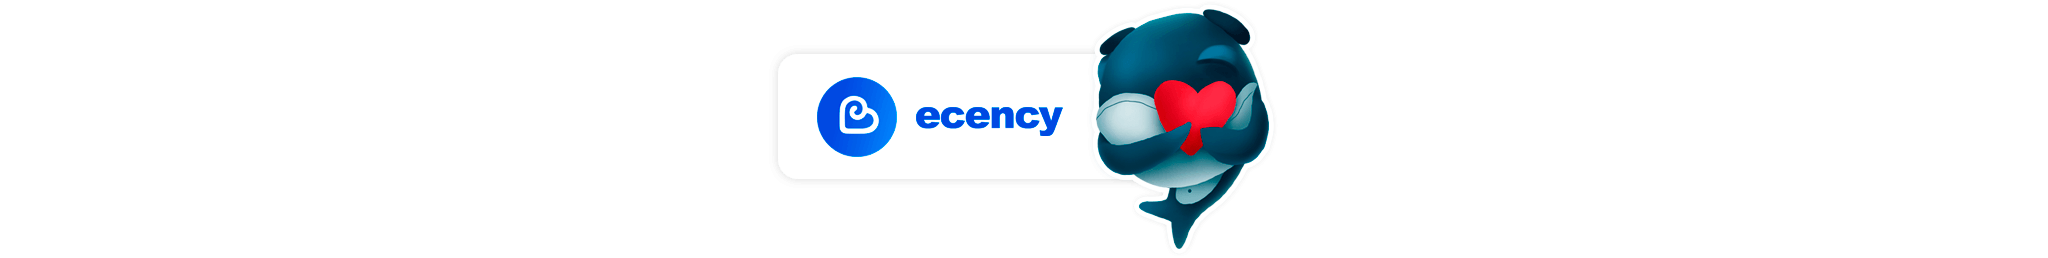 Ecency Love